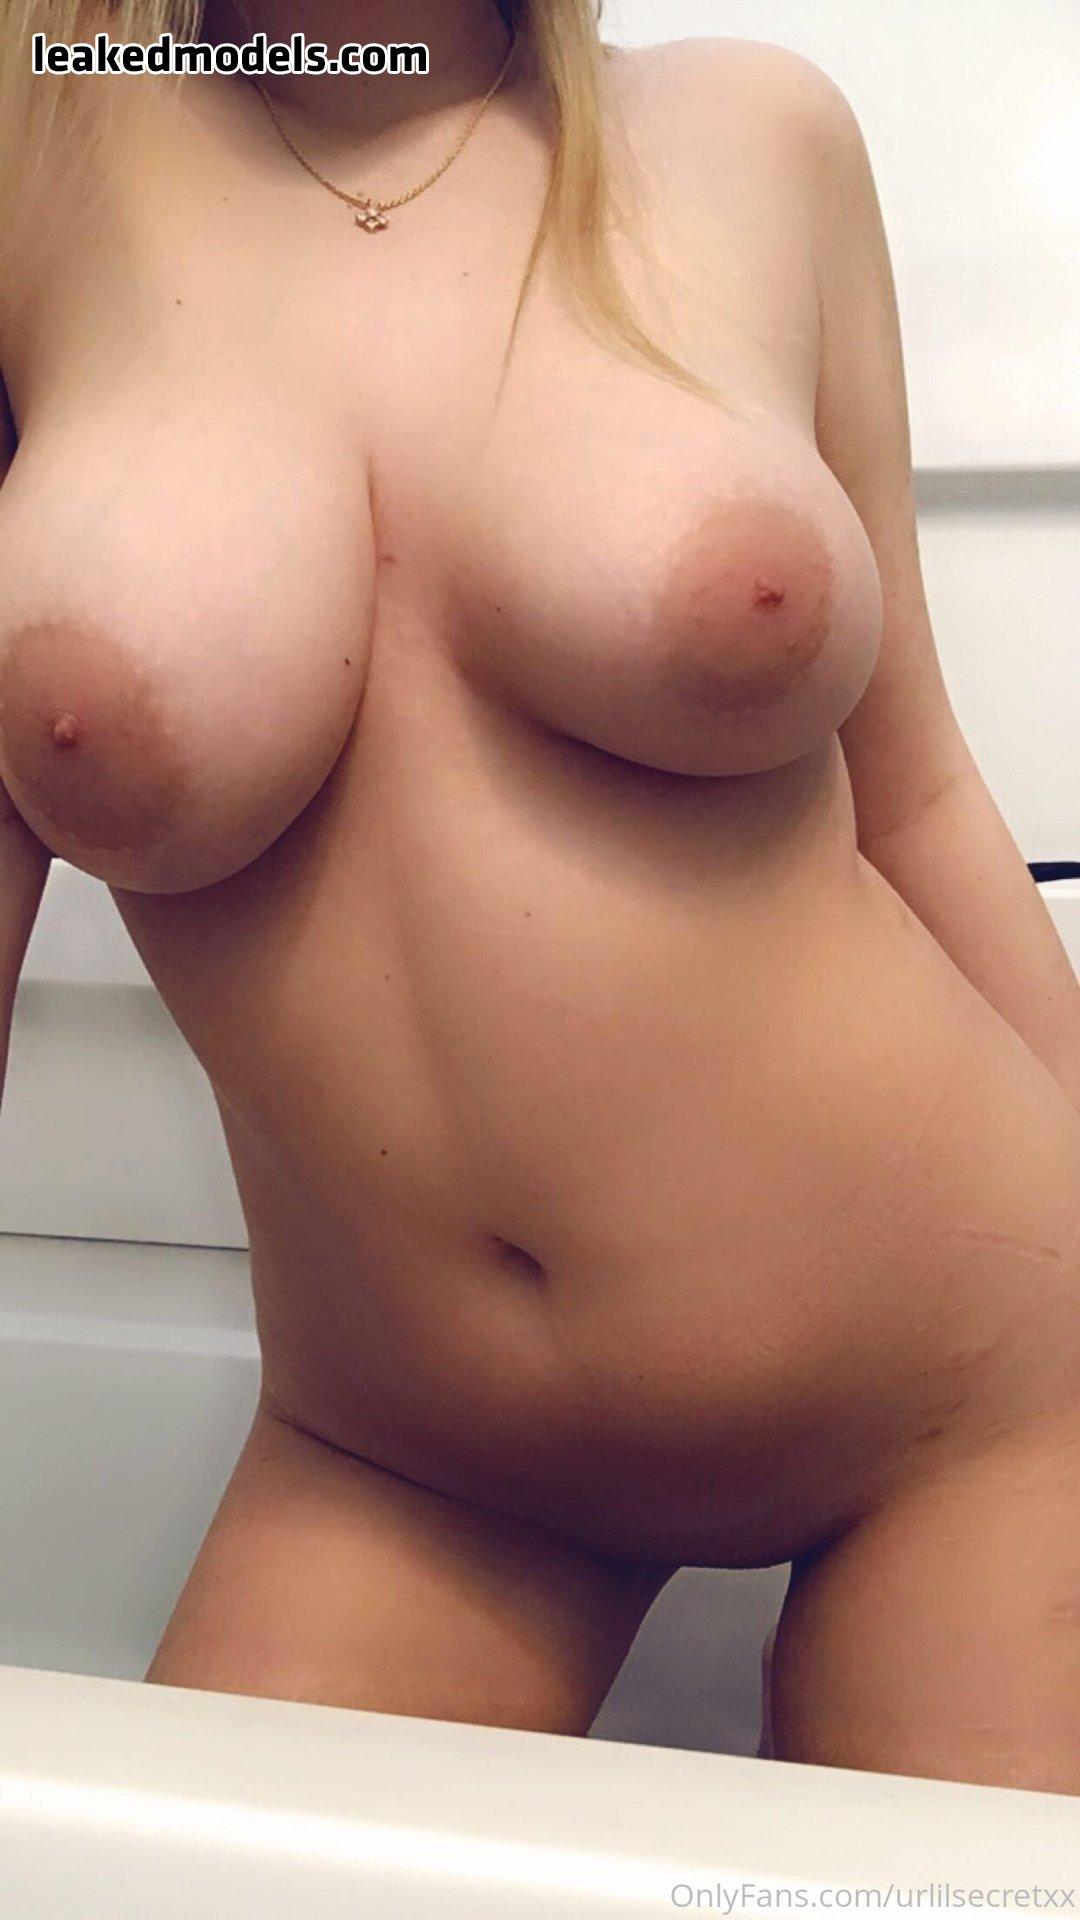 Urlilsecretxx gracie OnlyFans Nude Leaks (31 Photos)